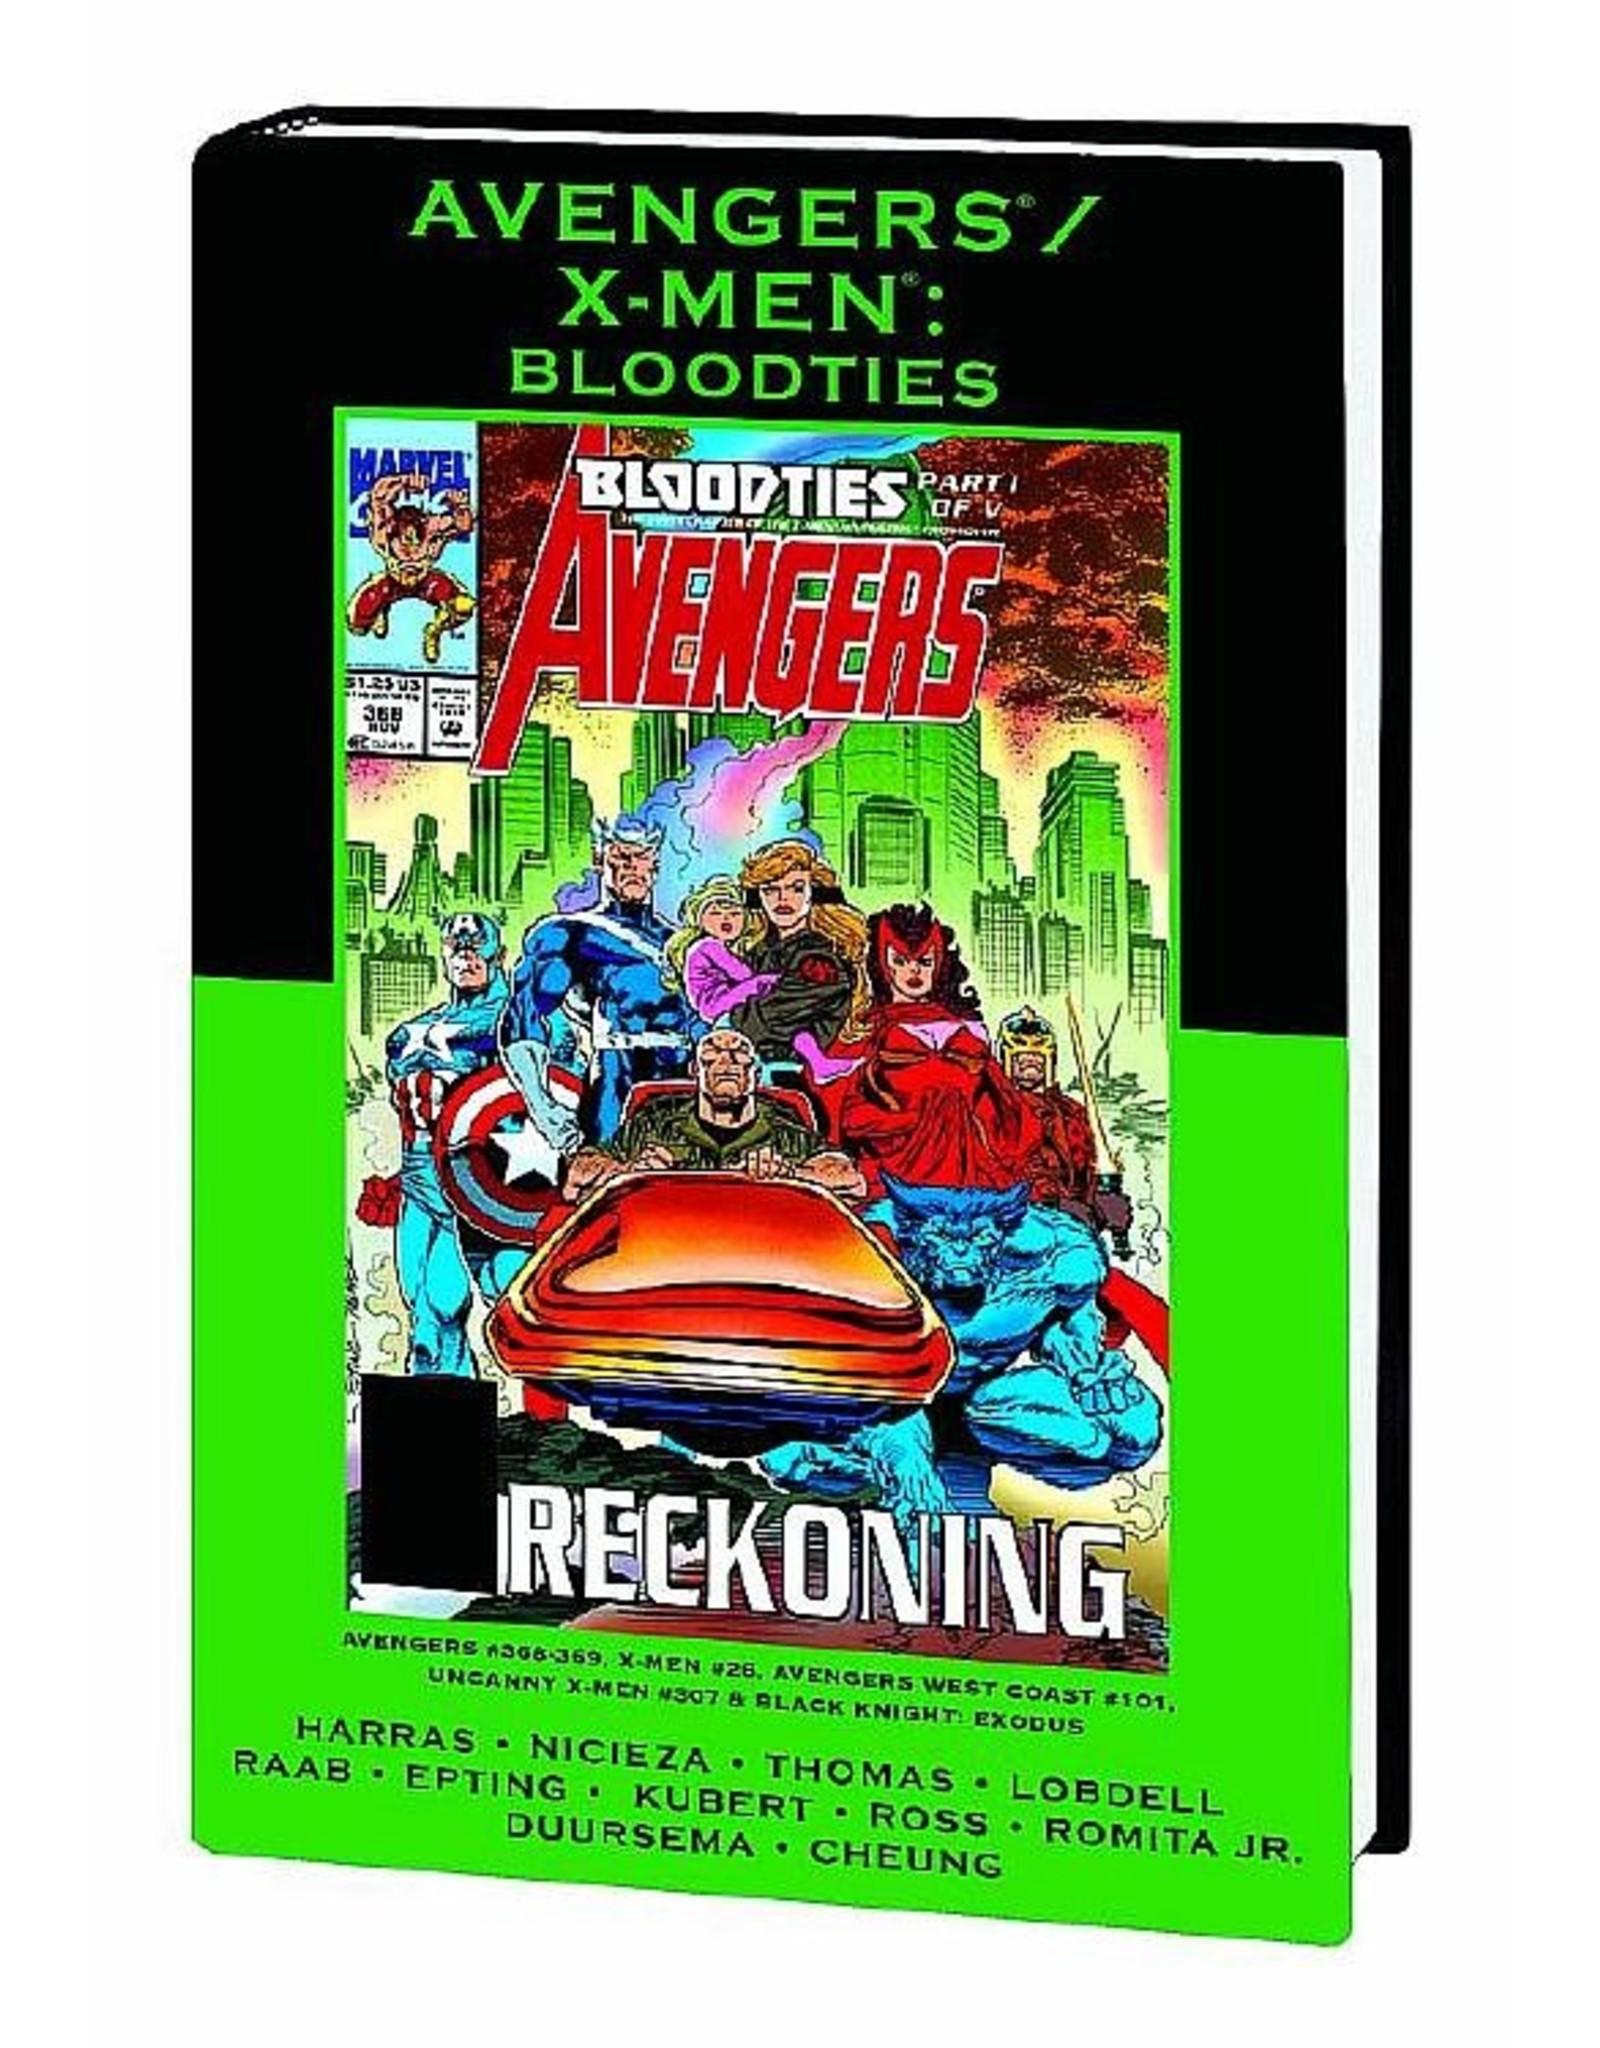 MARVEL COMICS AVENGERS X-MEN PREM HC BLOODTIES DM VAR ED 82 (OUT OF PRINT)